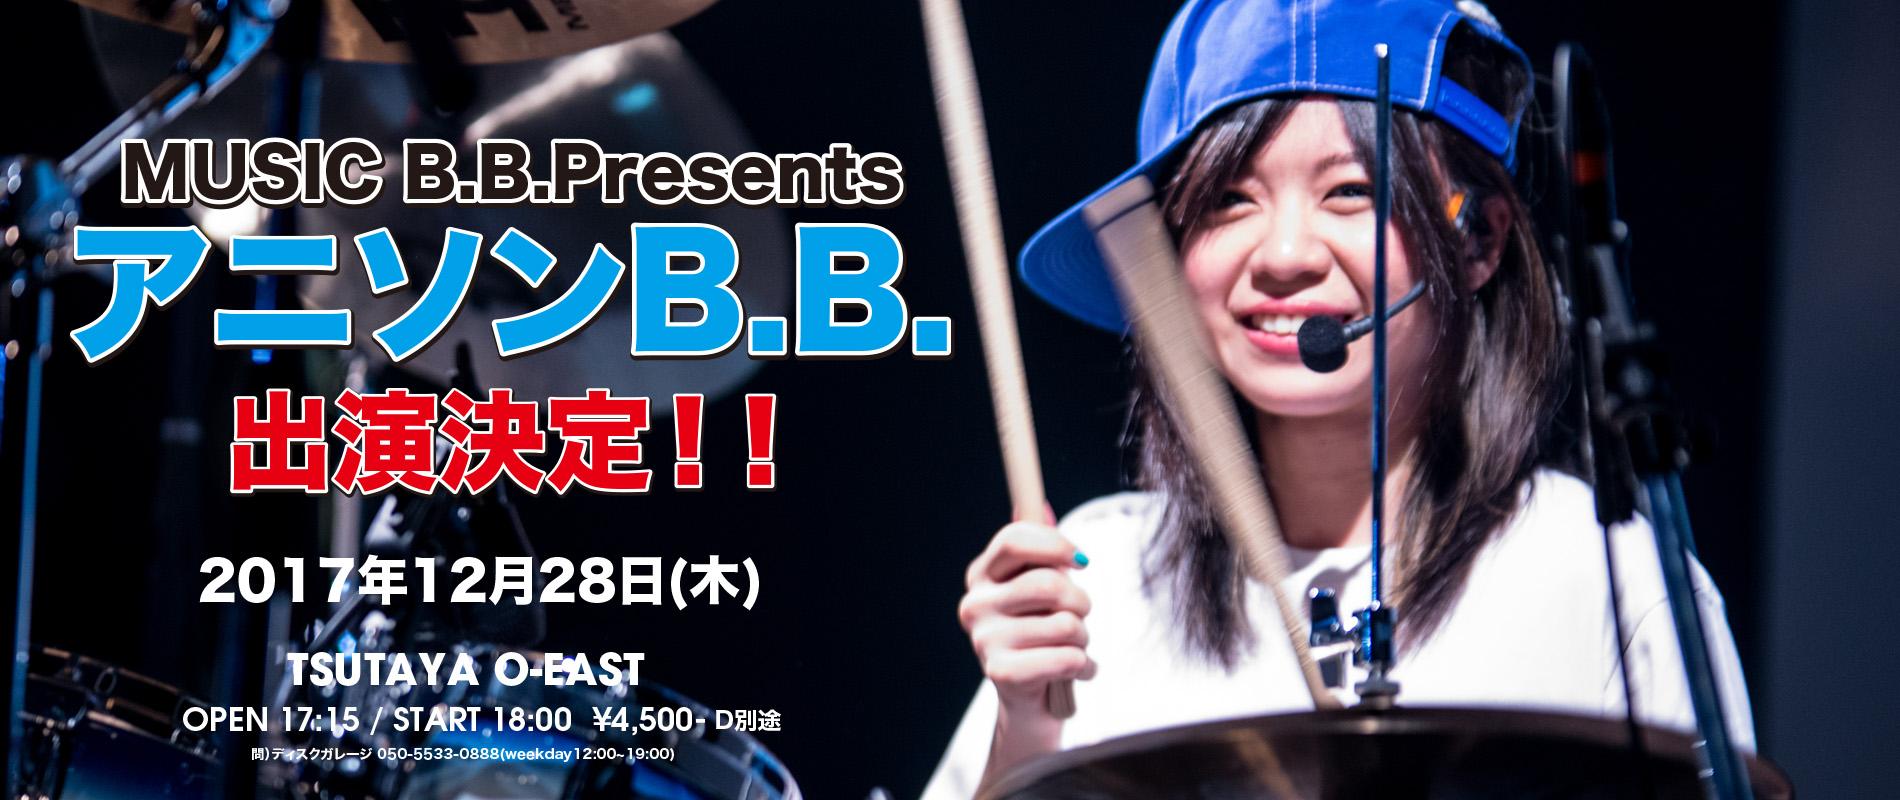 MUSIC B.B.Presents アニソンB.B.出演!